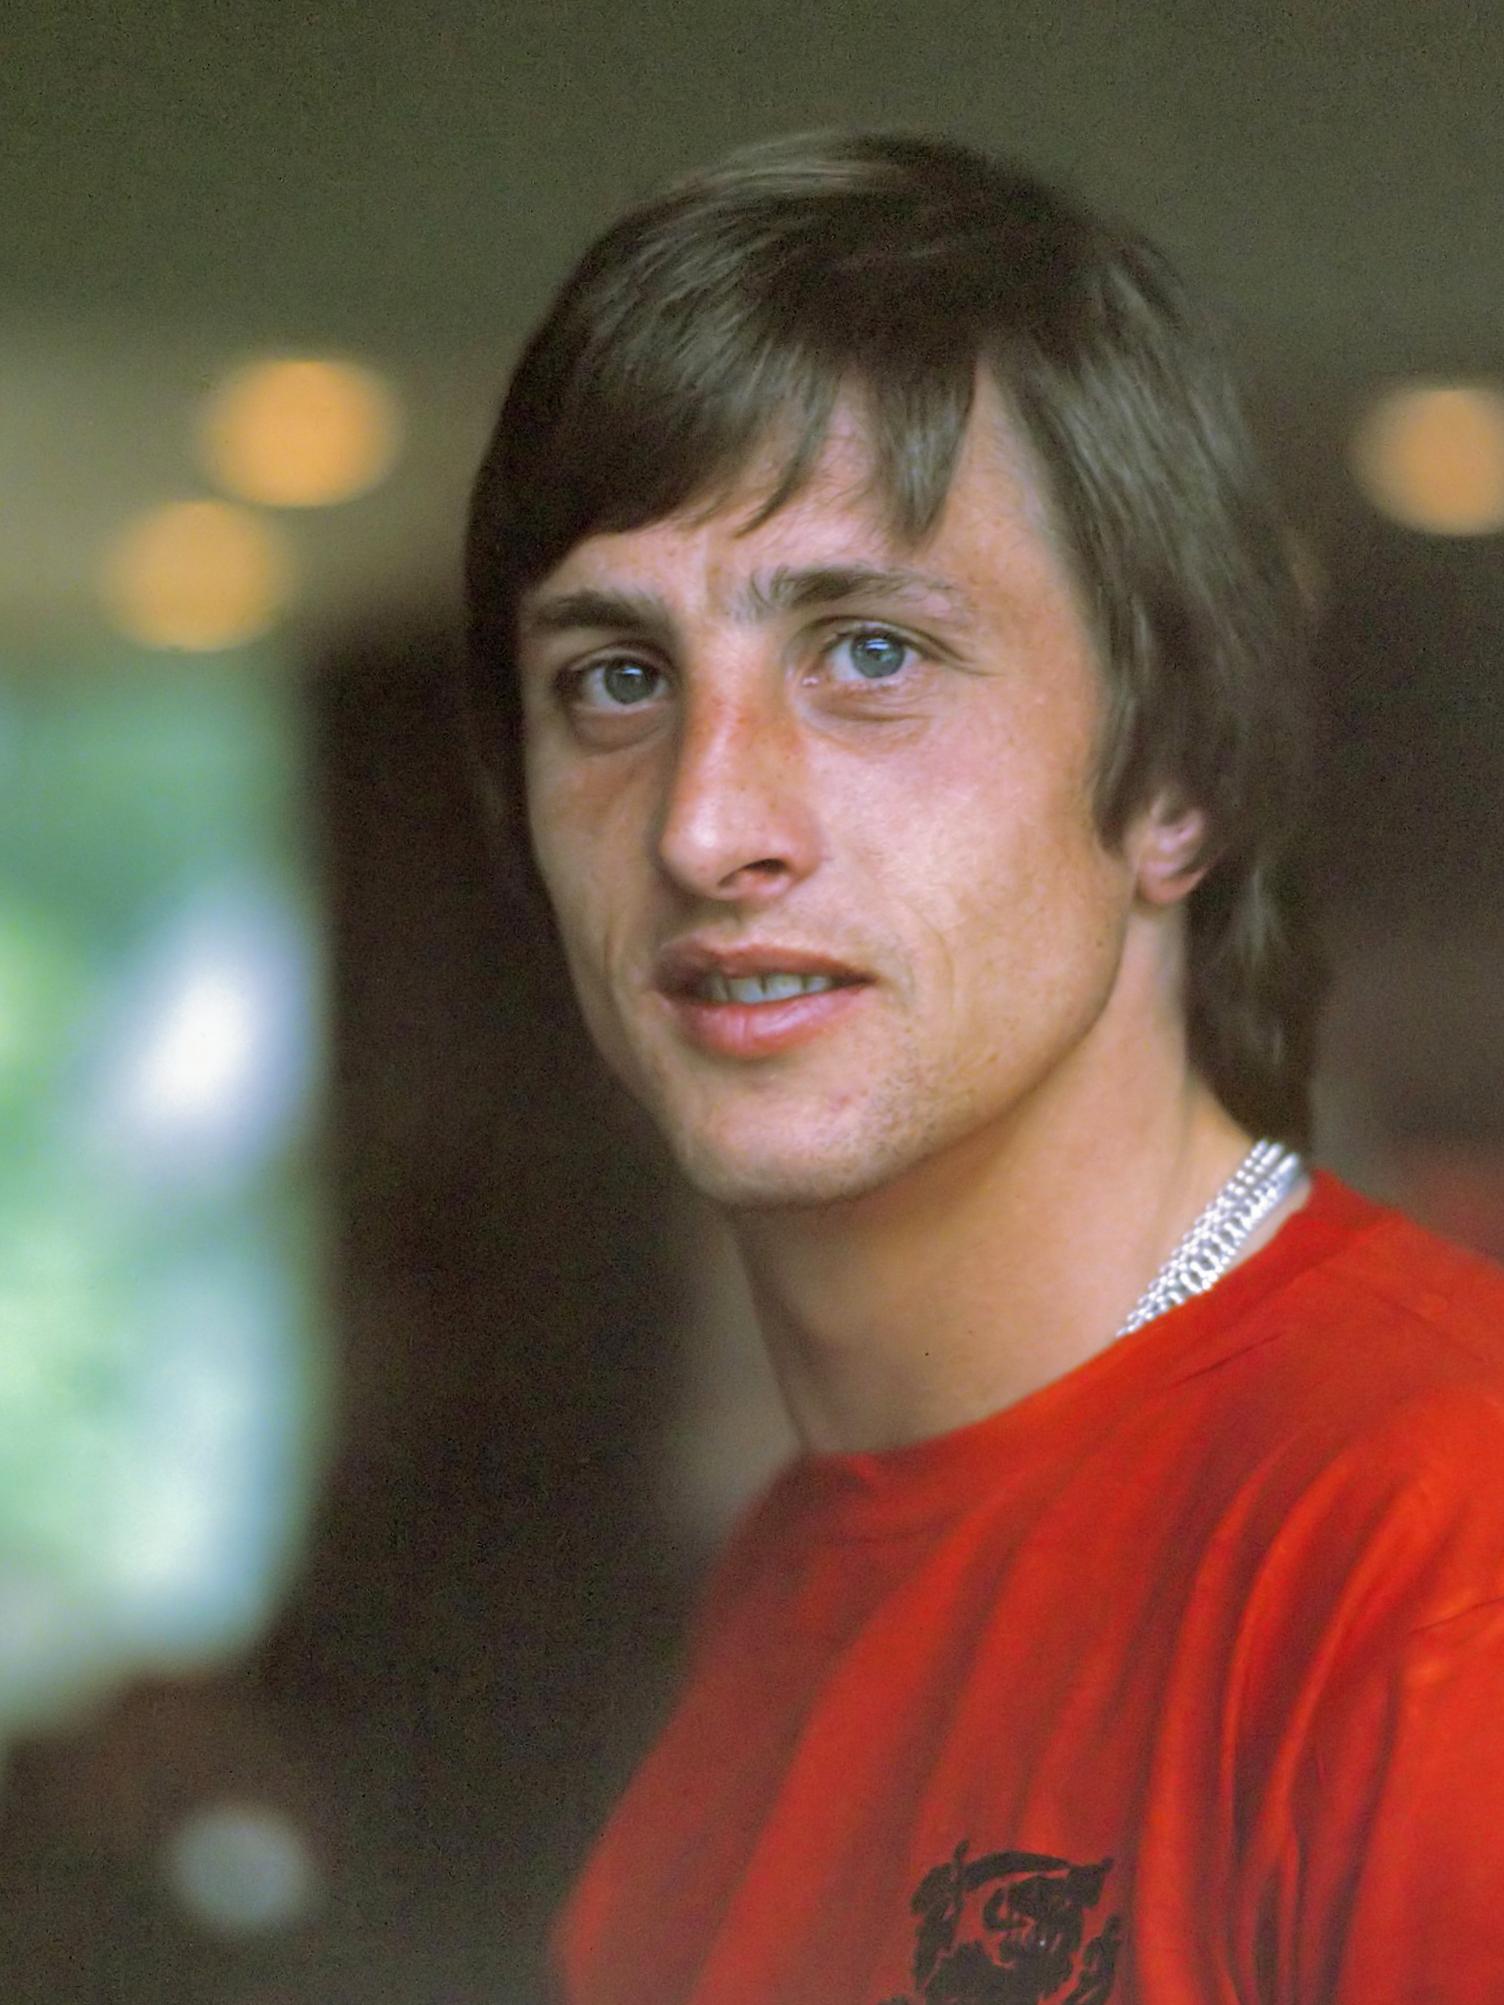 Photo Johan Cruyff via Opendata BNF